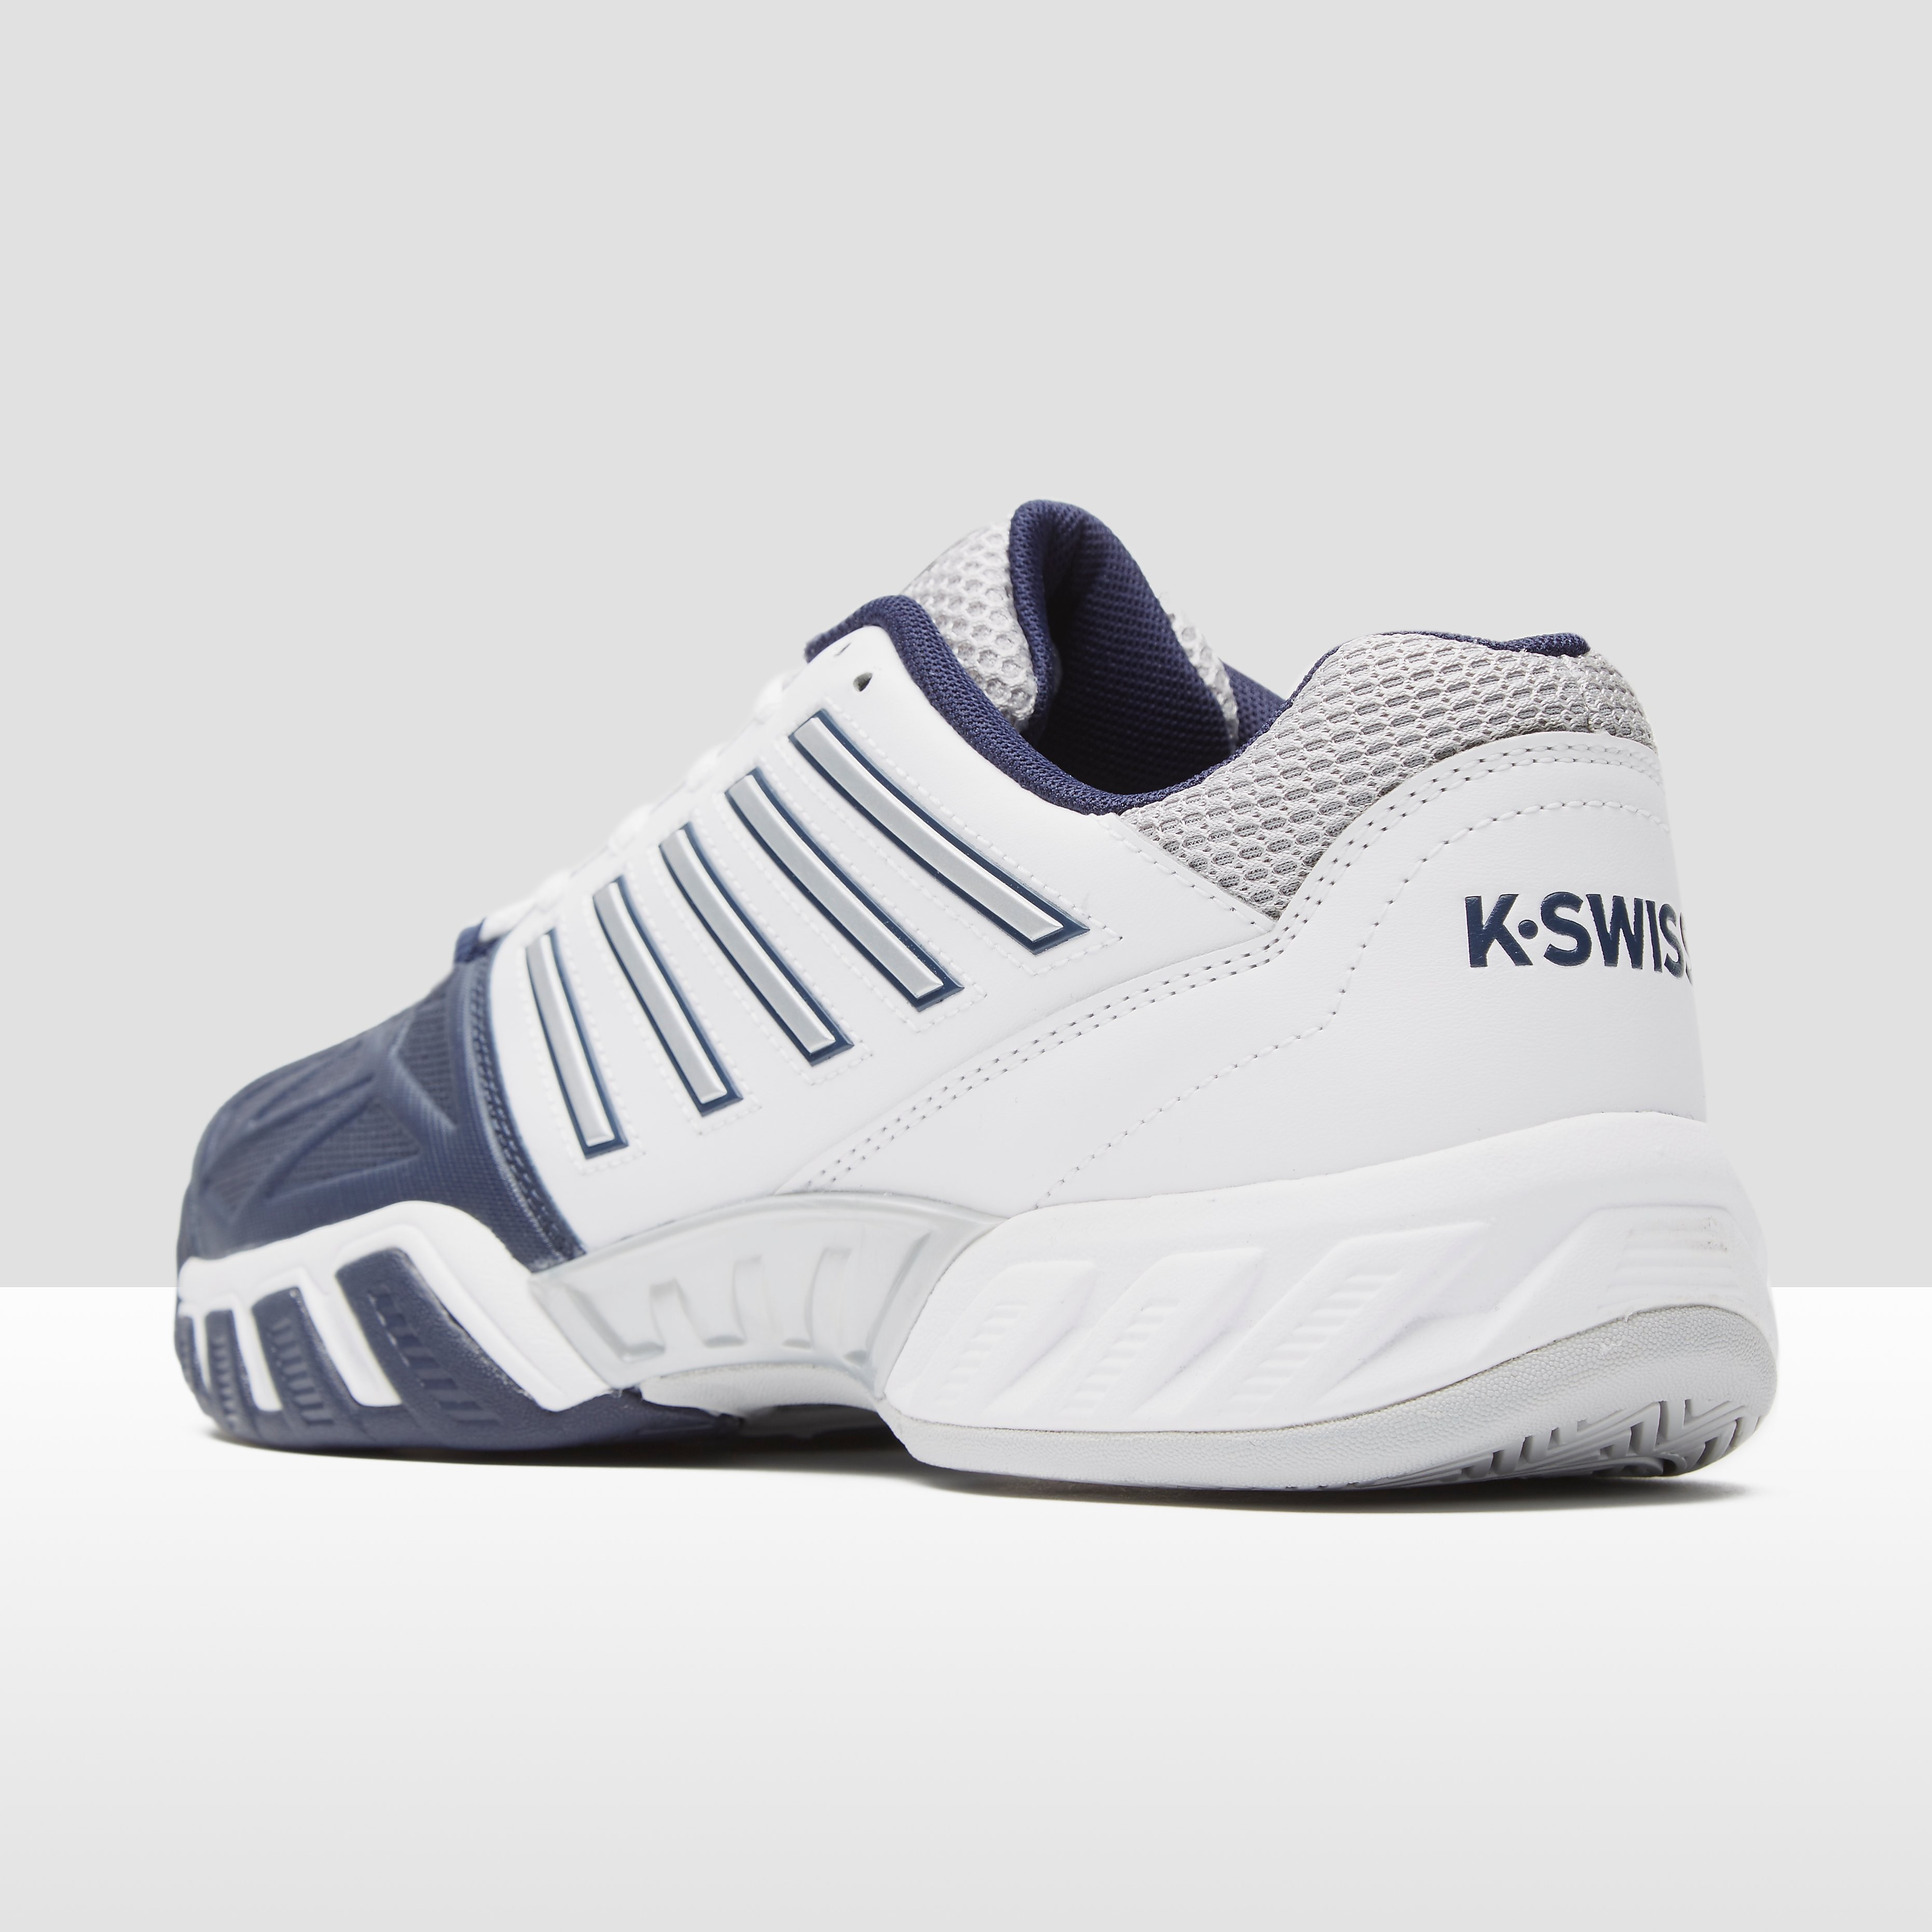 K-Swiss Big Shot Light 3 Men's Tennis Shoes